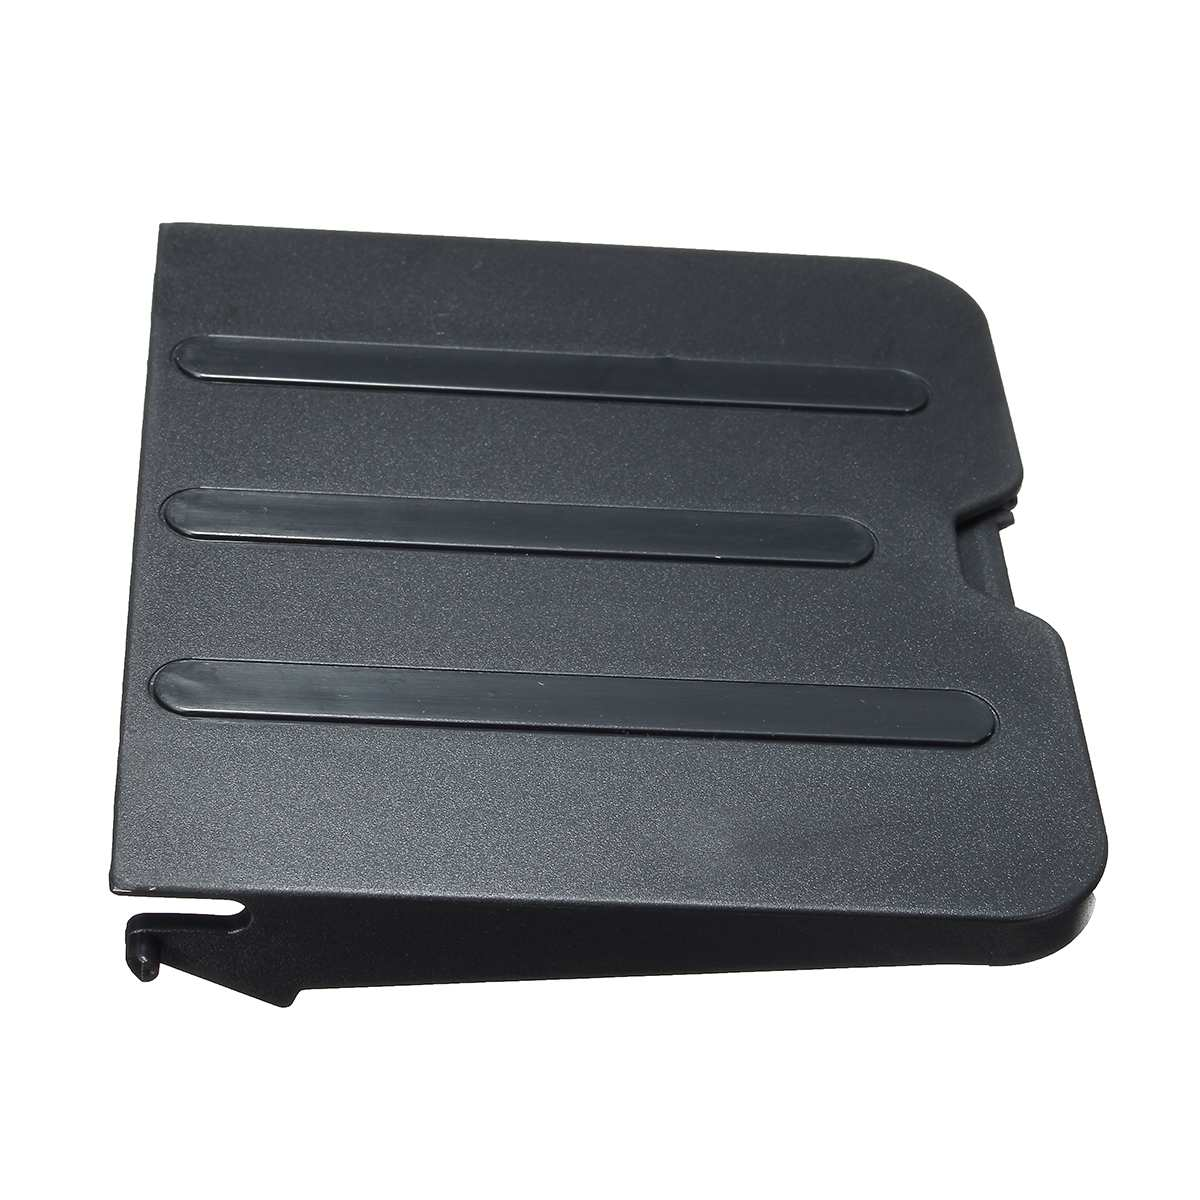 Выход Бумага лоток для H P Laserjet RM1-7727 M1132 M1136 M1212 1214 1216 1217NFW 108x118 мм